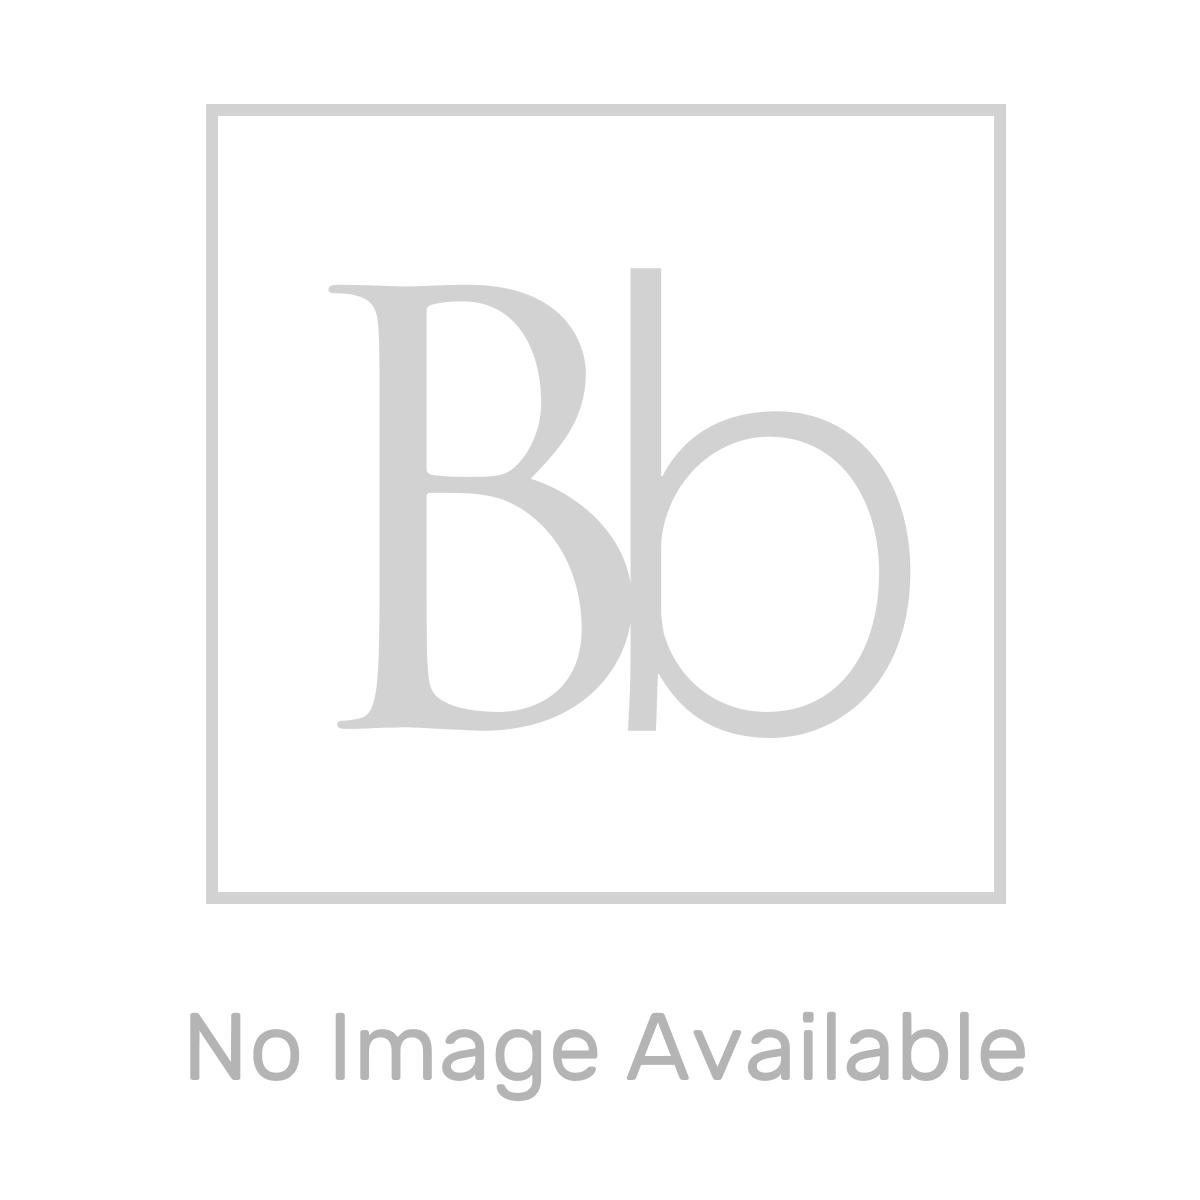 Aquadart White Slate Shower Tray 1600 x 800 Dimension